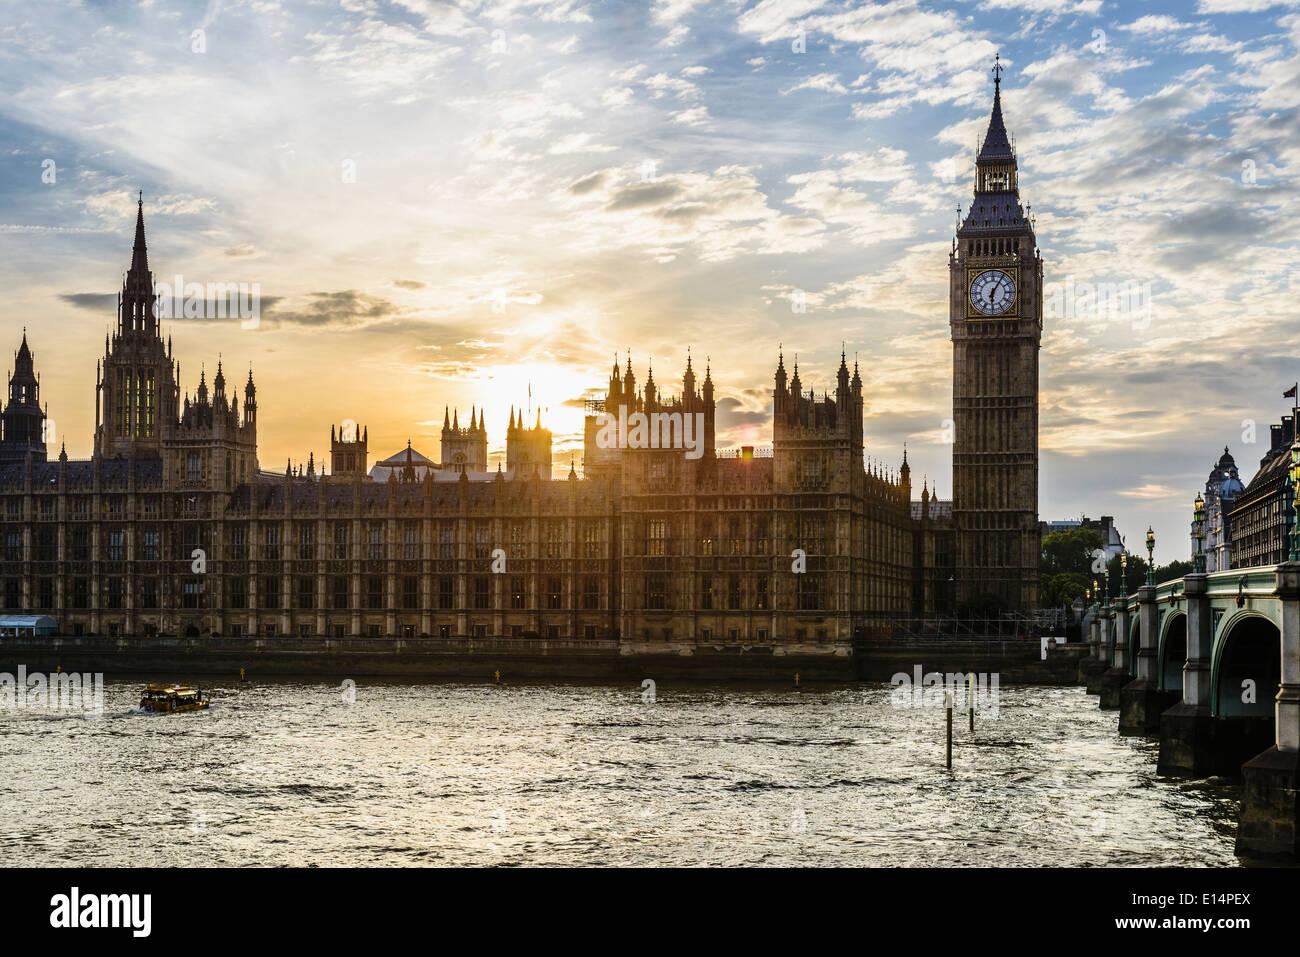 Sonnenuntergang über Houses of Parliament, London, Vereinigtes Königreich Stockbild